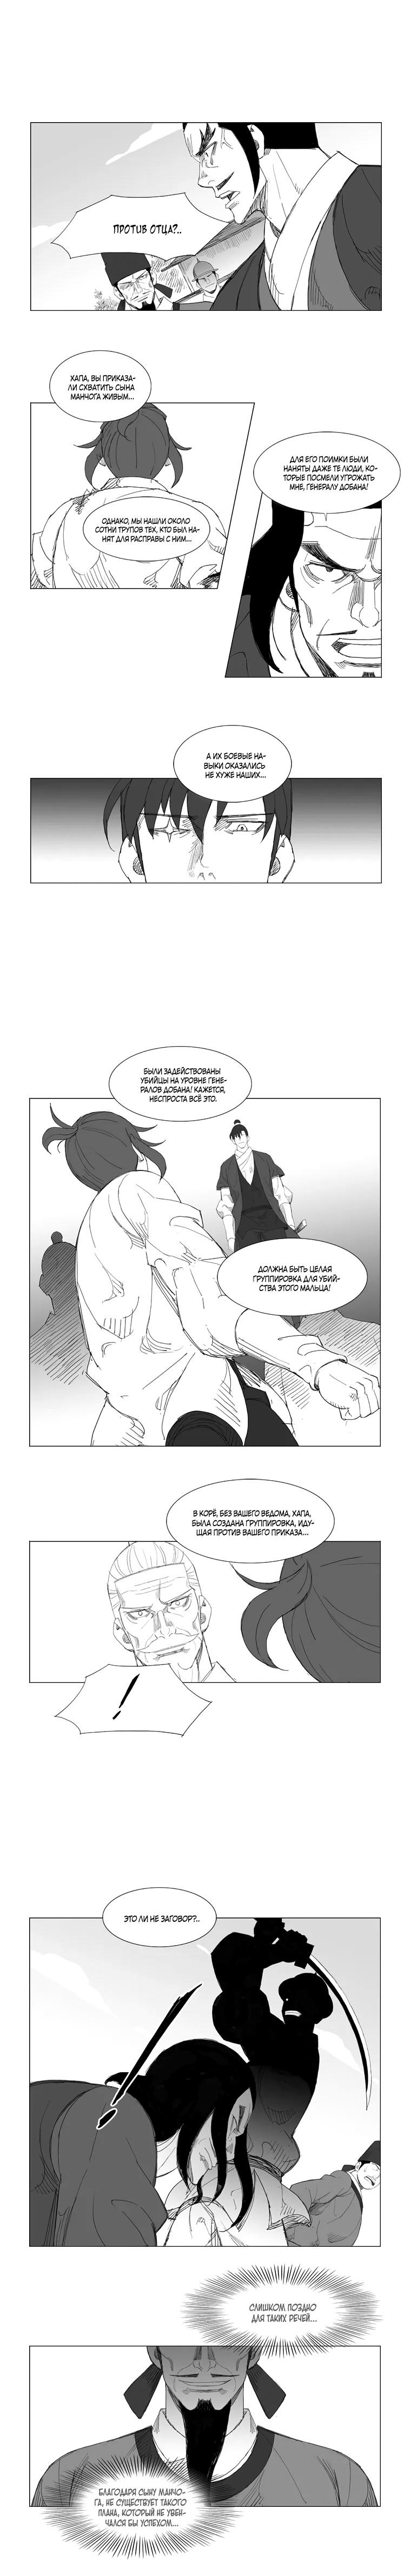 https://r1.ninemanga.com/comics/pic2/39/28263/411782/152401357238.jpg Page 3